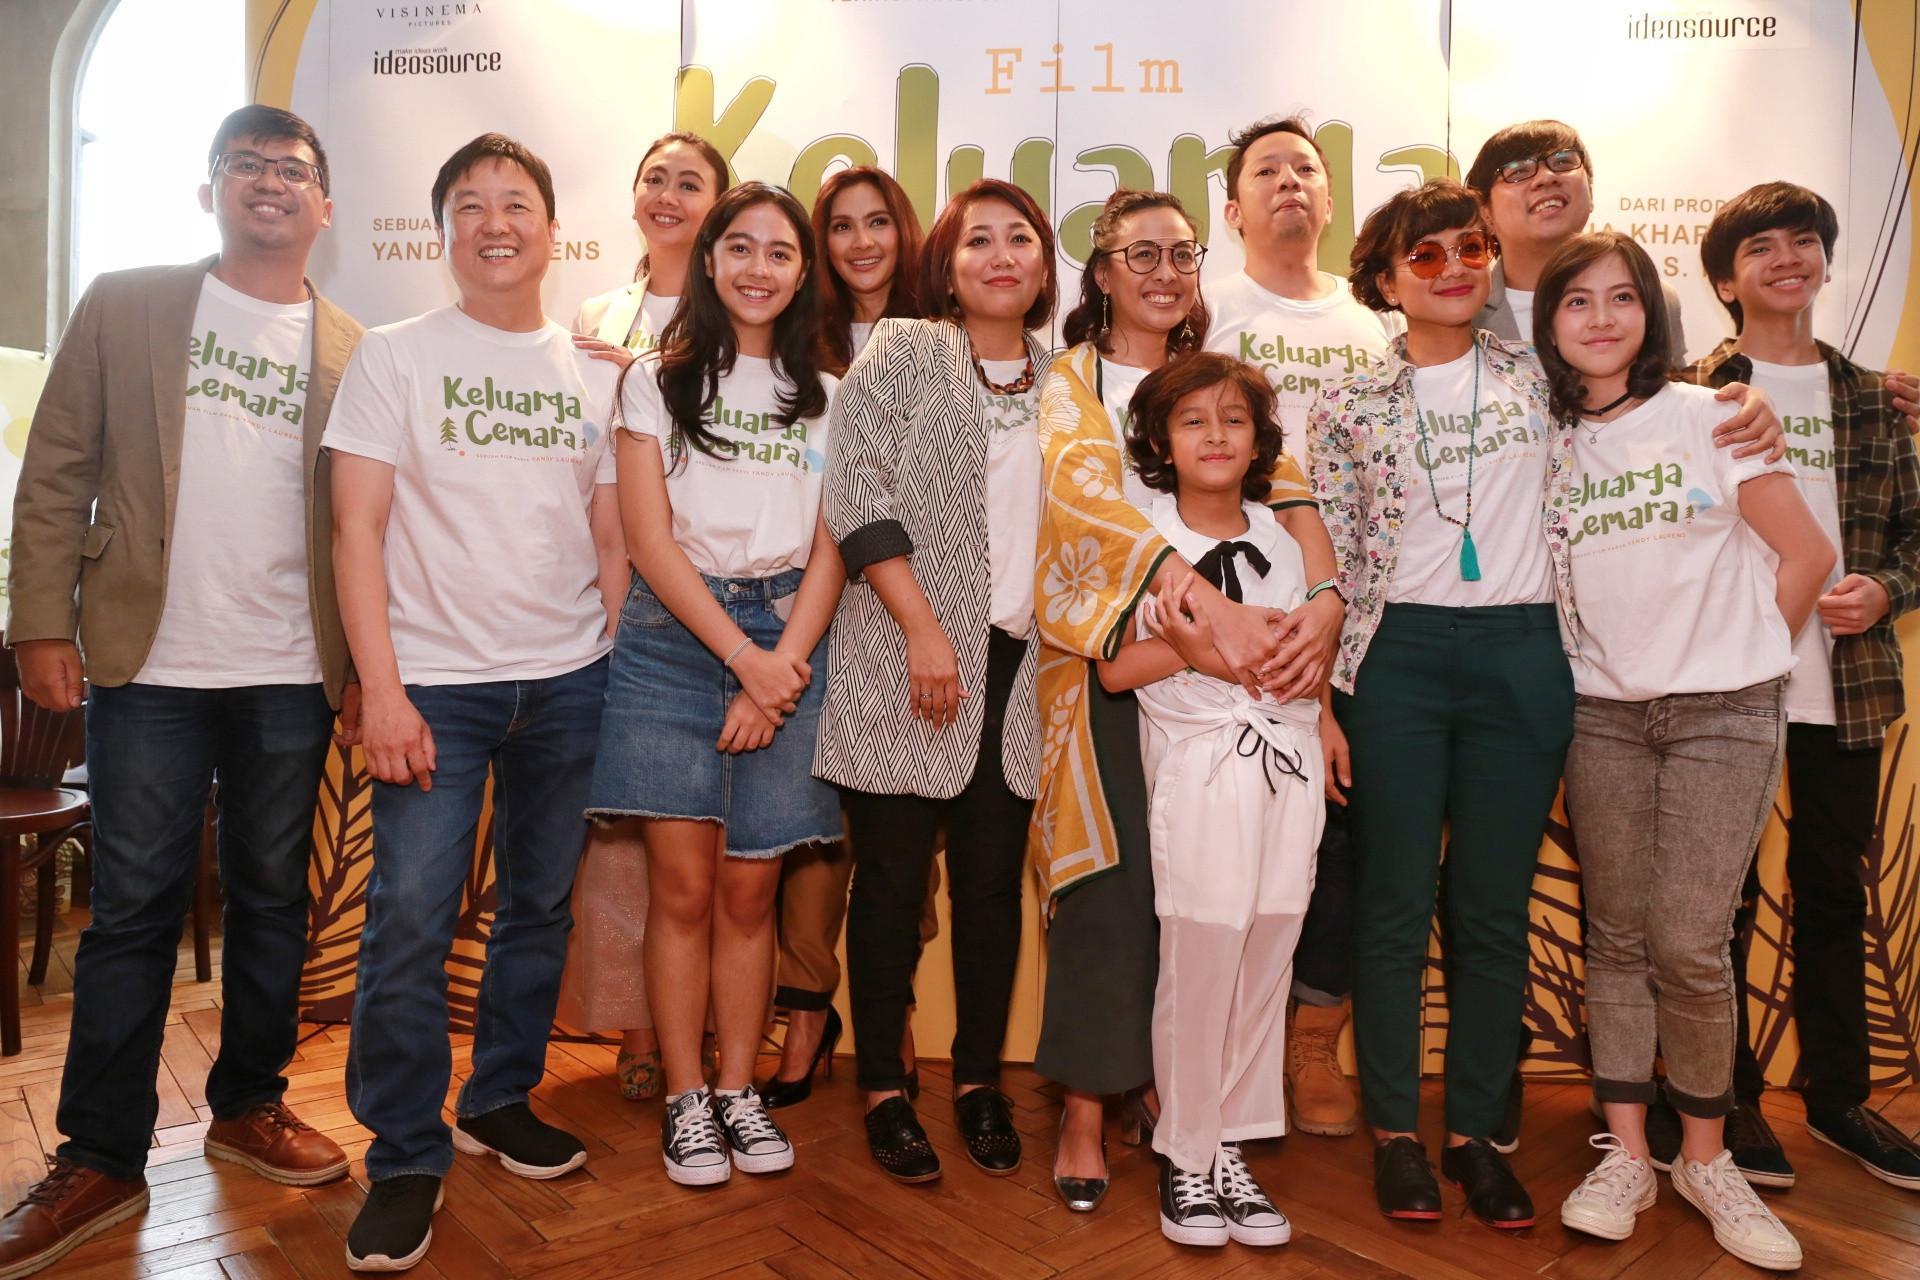 Keluarga Cemara (Adrian Putra/Bintang.com)